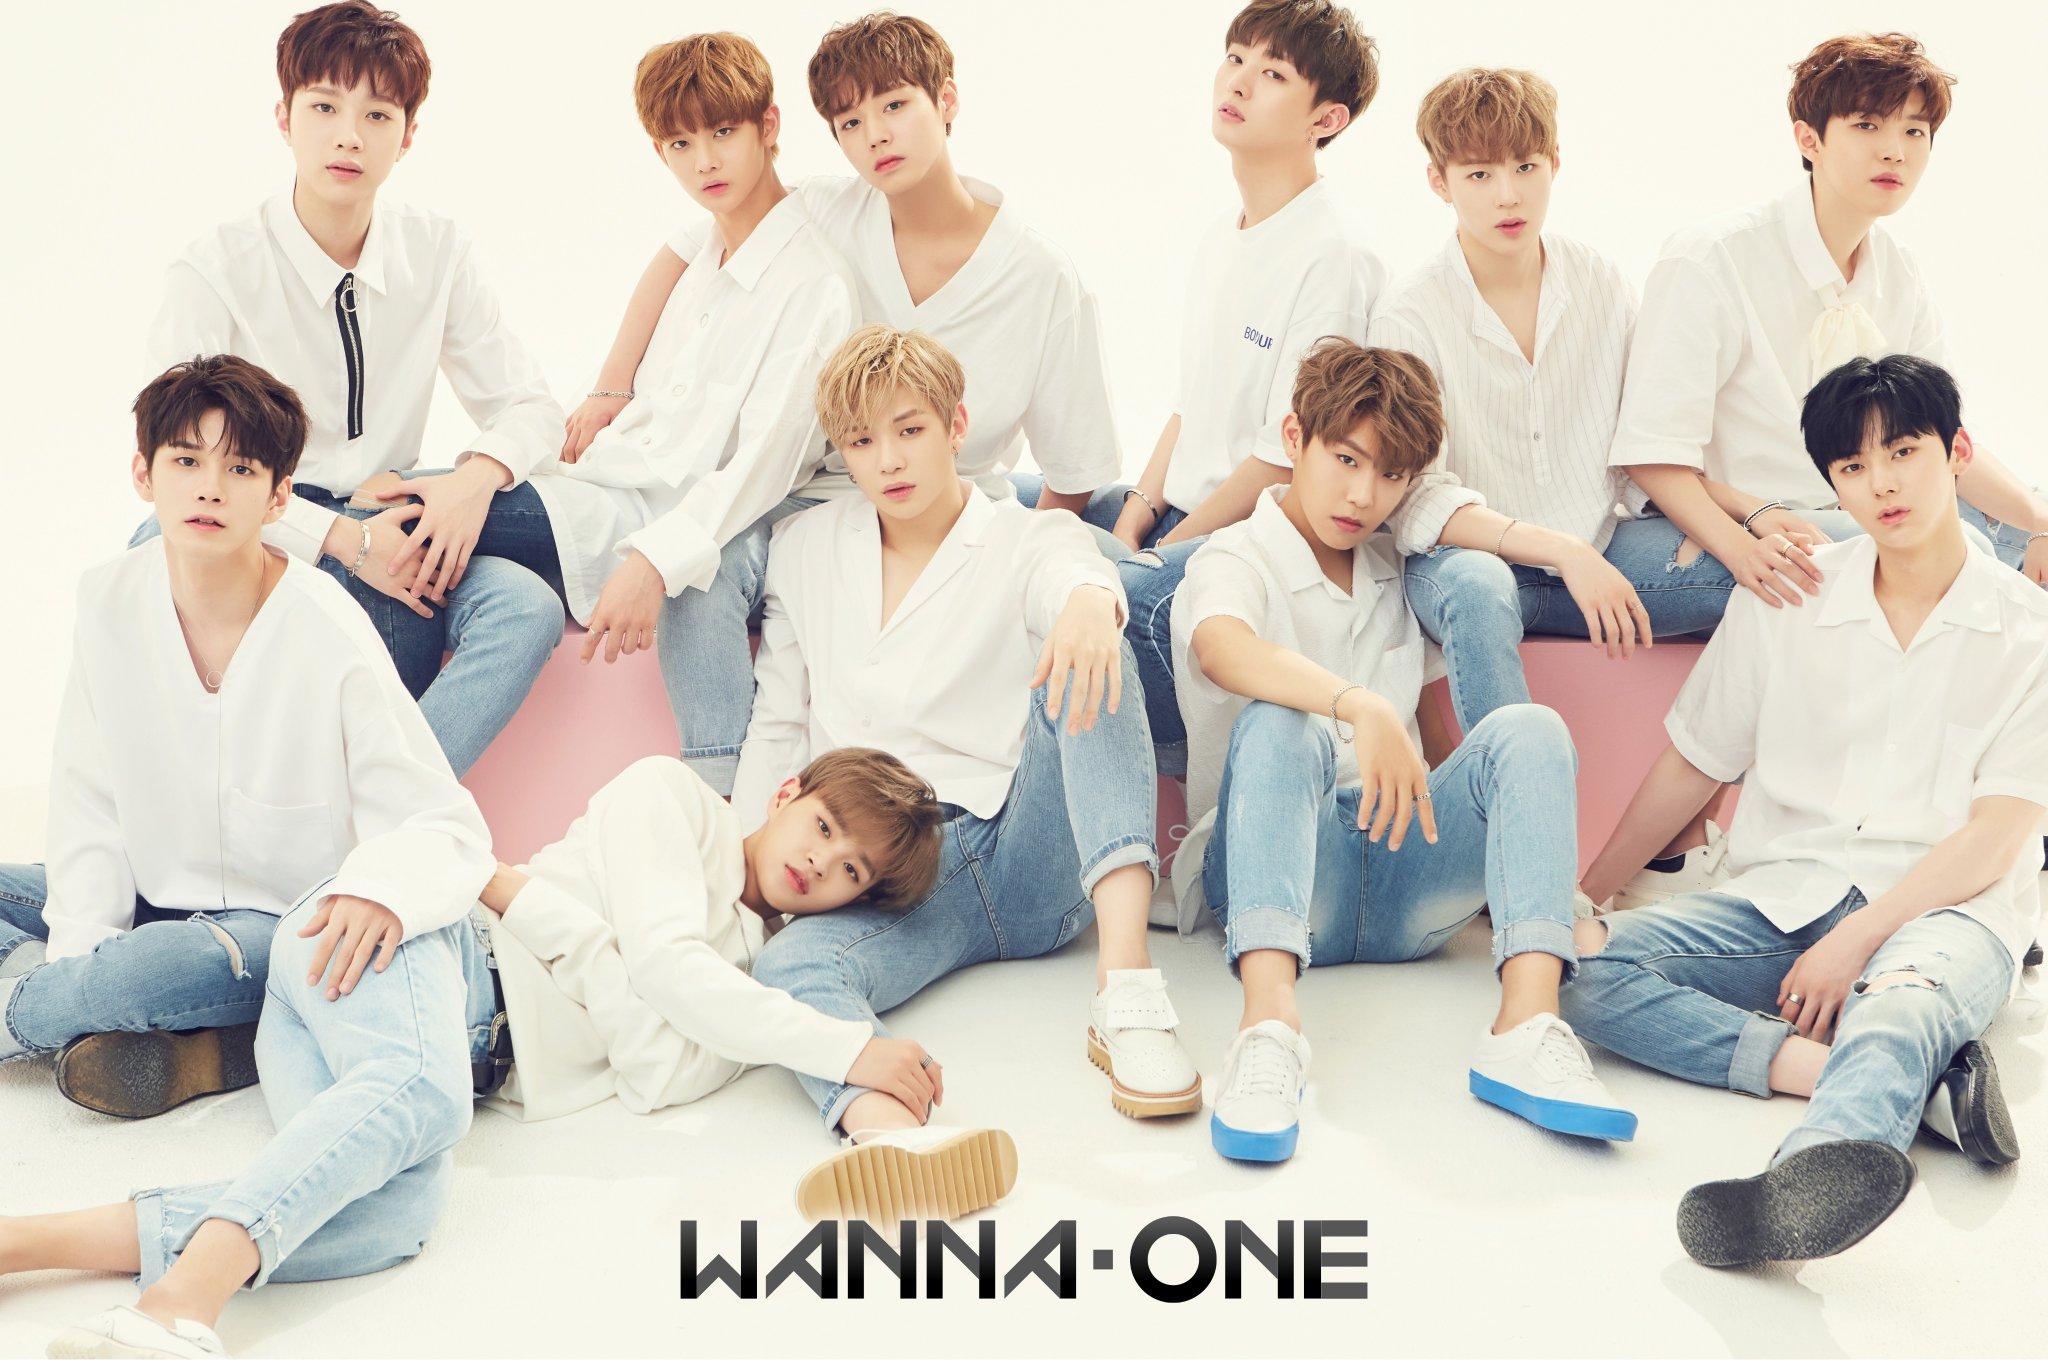 Wanna-One.jpg